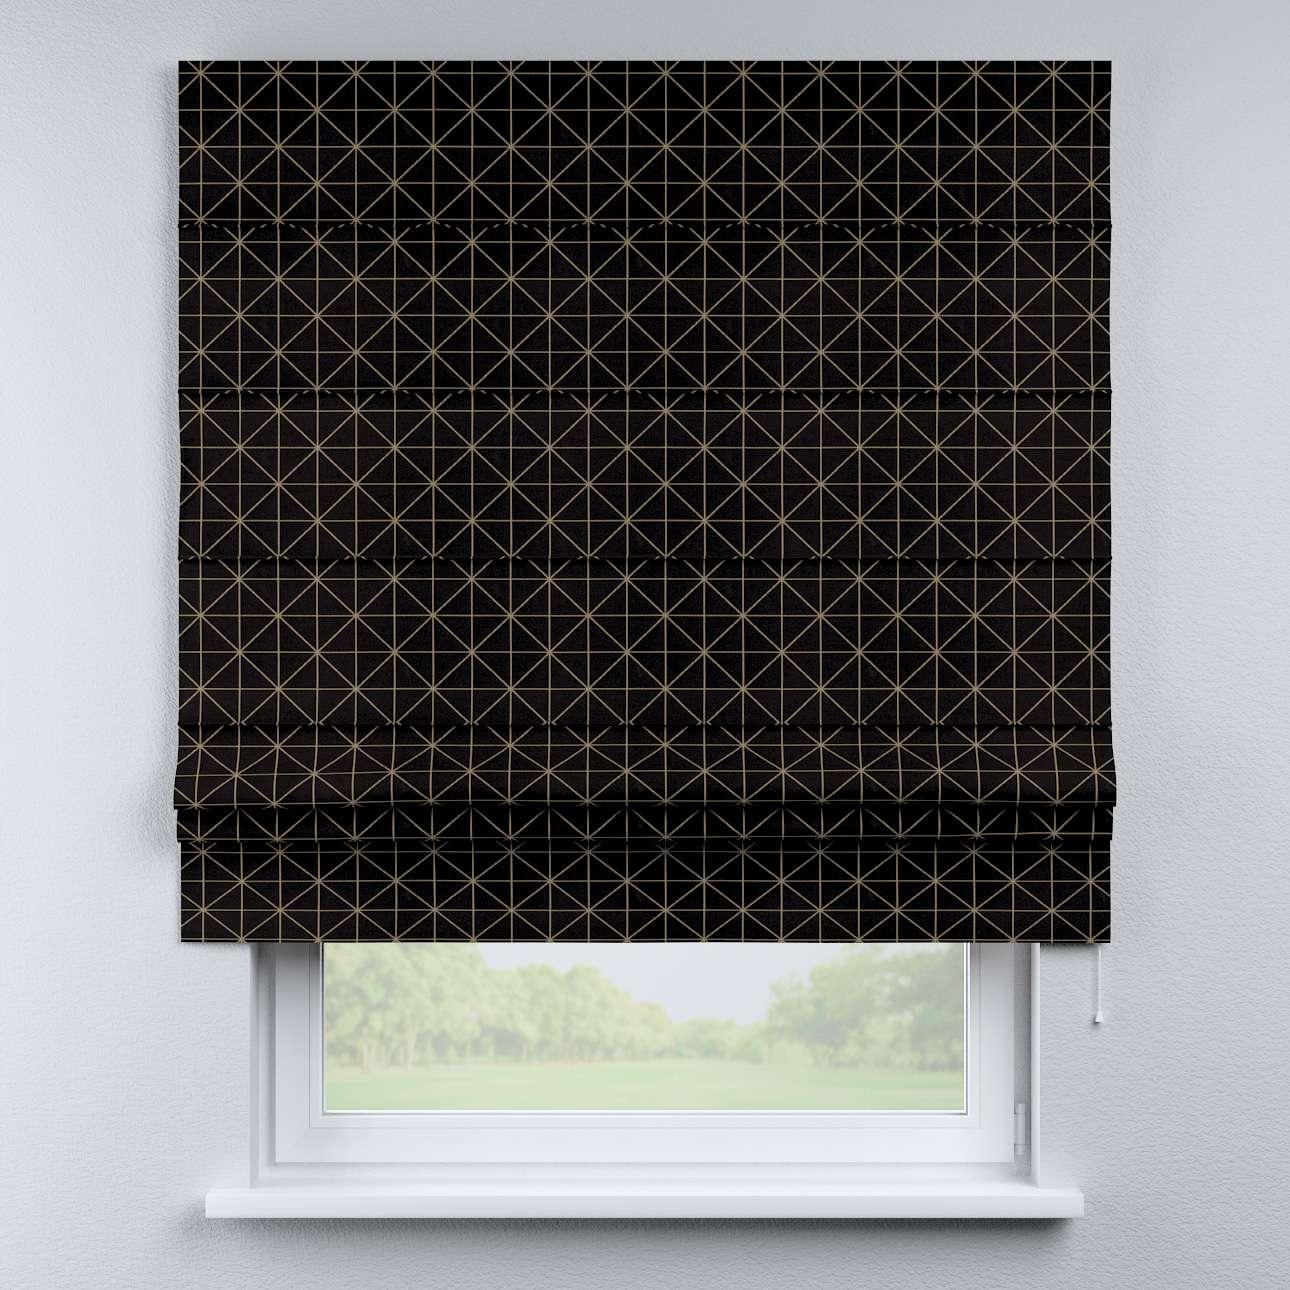 Vouwgordijn Padva van de collectie Black & White, Stof: 142-55